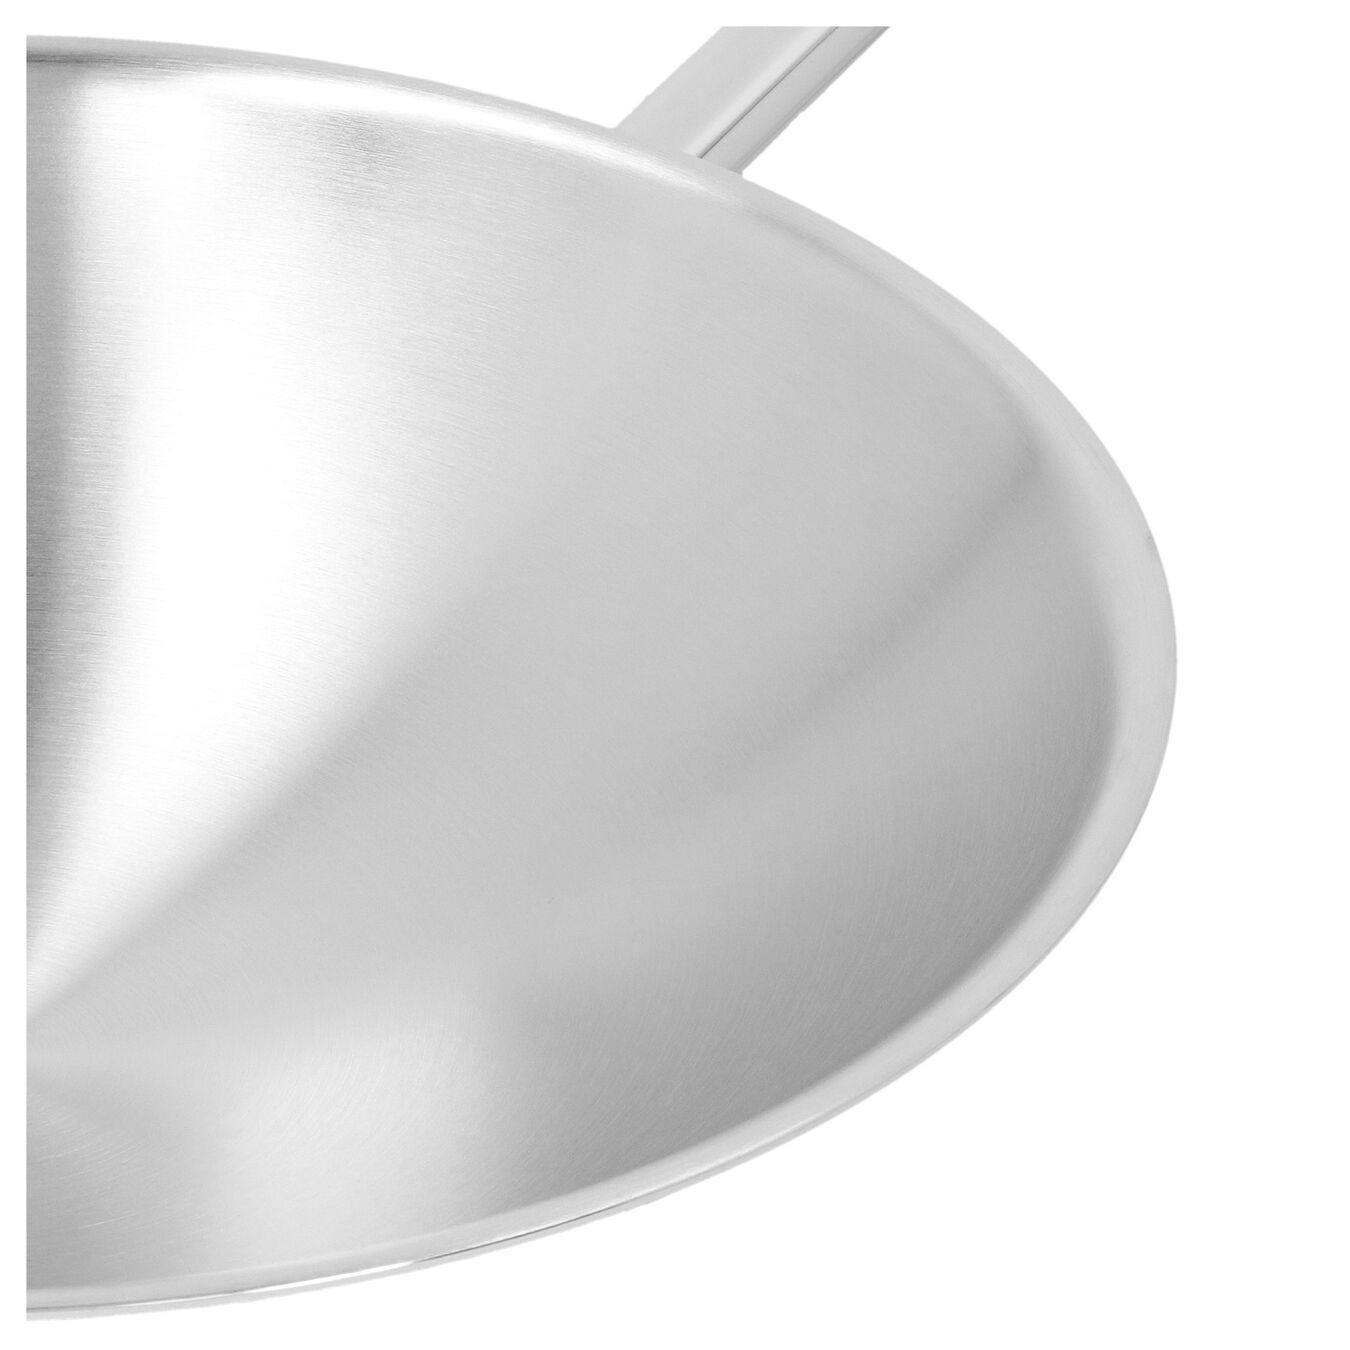 Wok fondo tondo - 36 cm, 18/10 acciaio inossidabile,,large 3